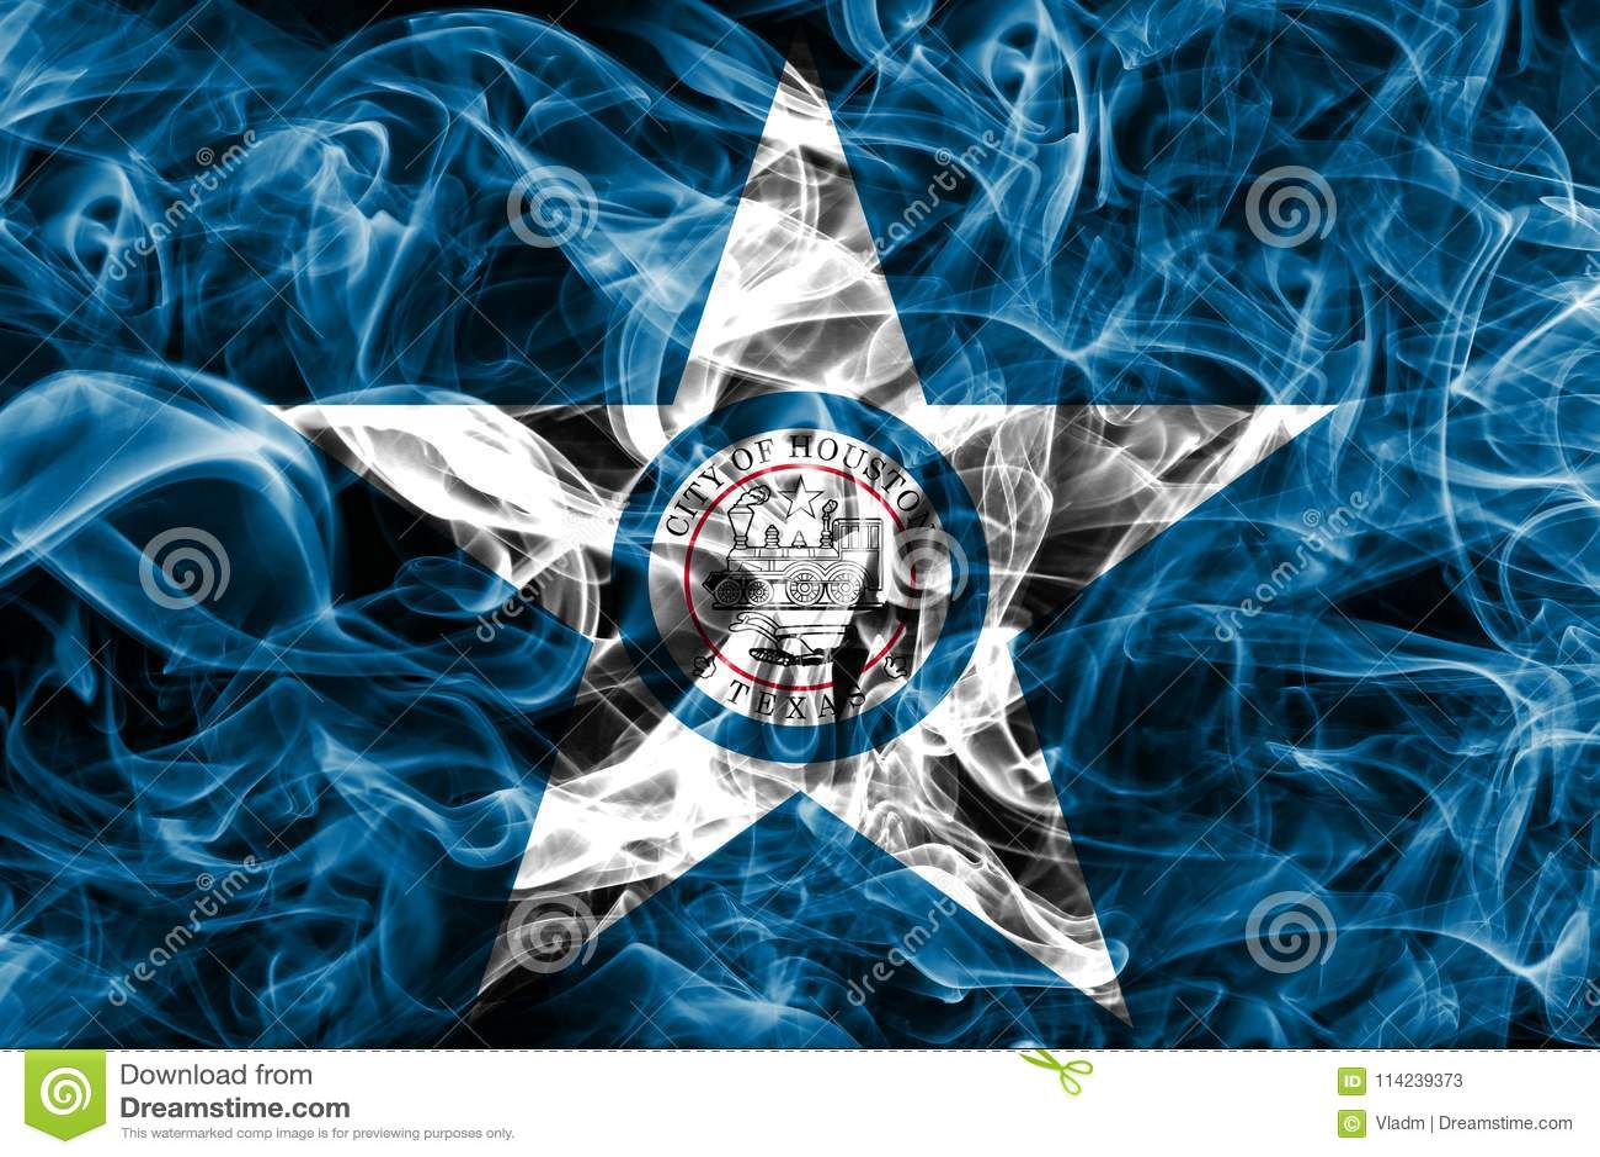 Houston miasta dymu flaga, Teksas stan, Stany Zjednoczone Ameryka